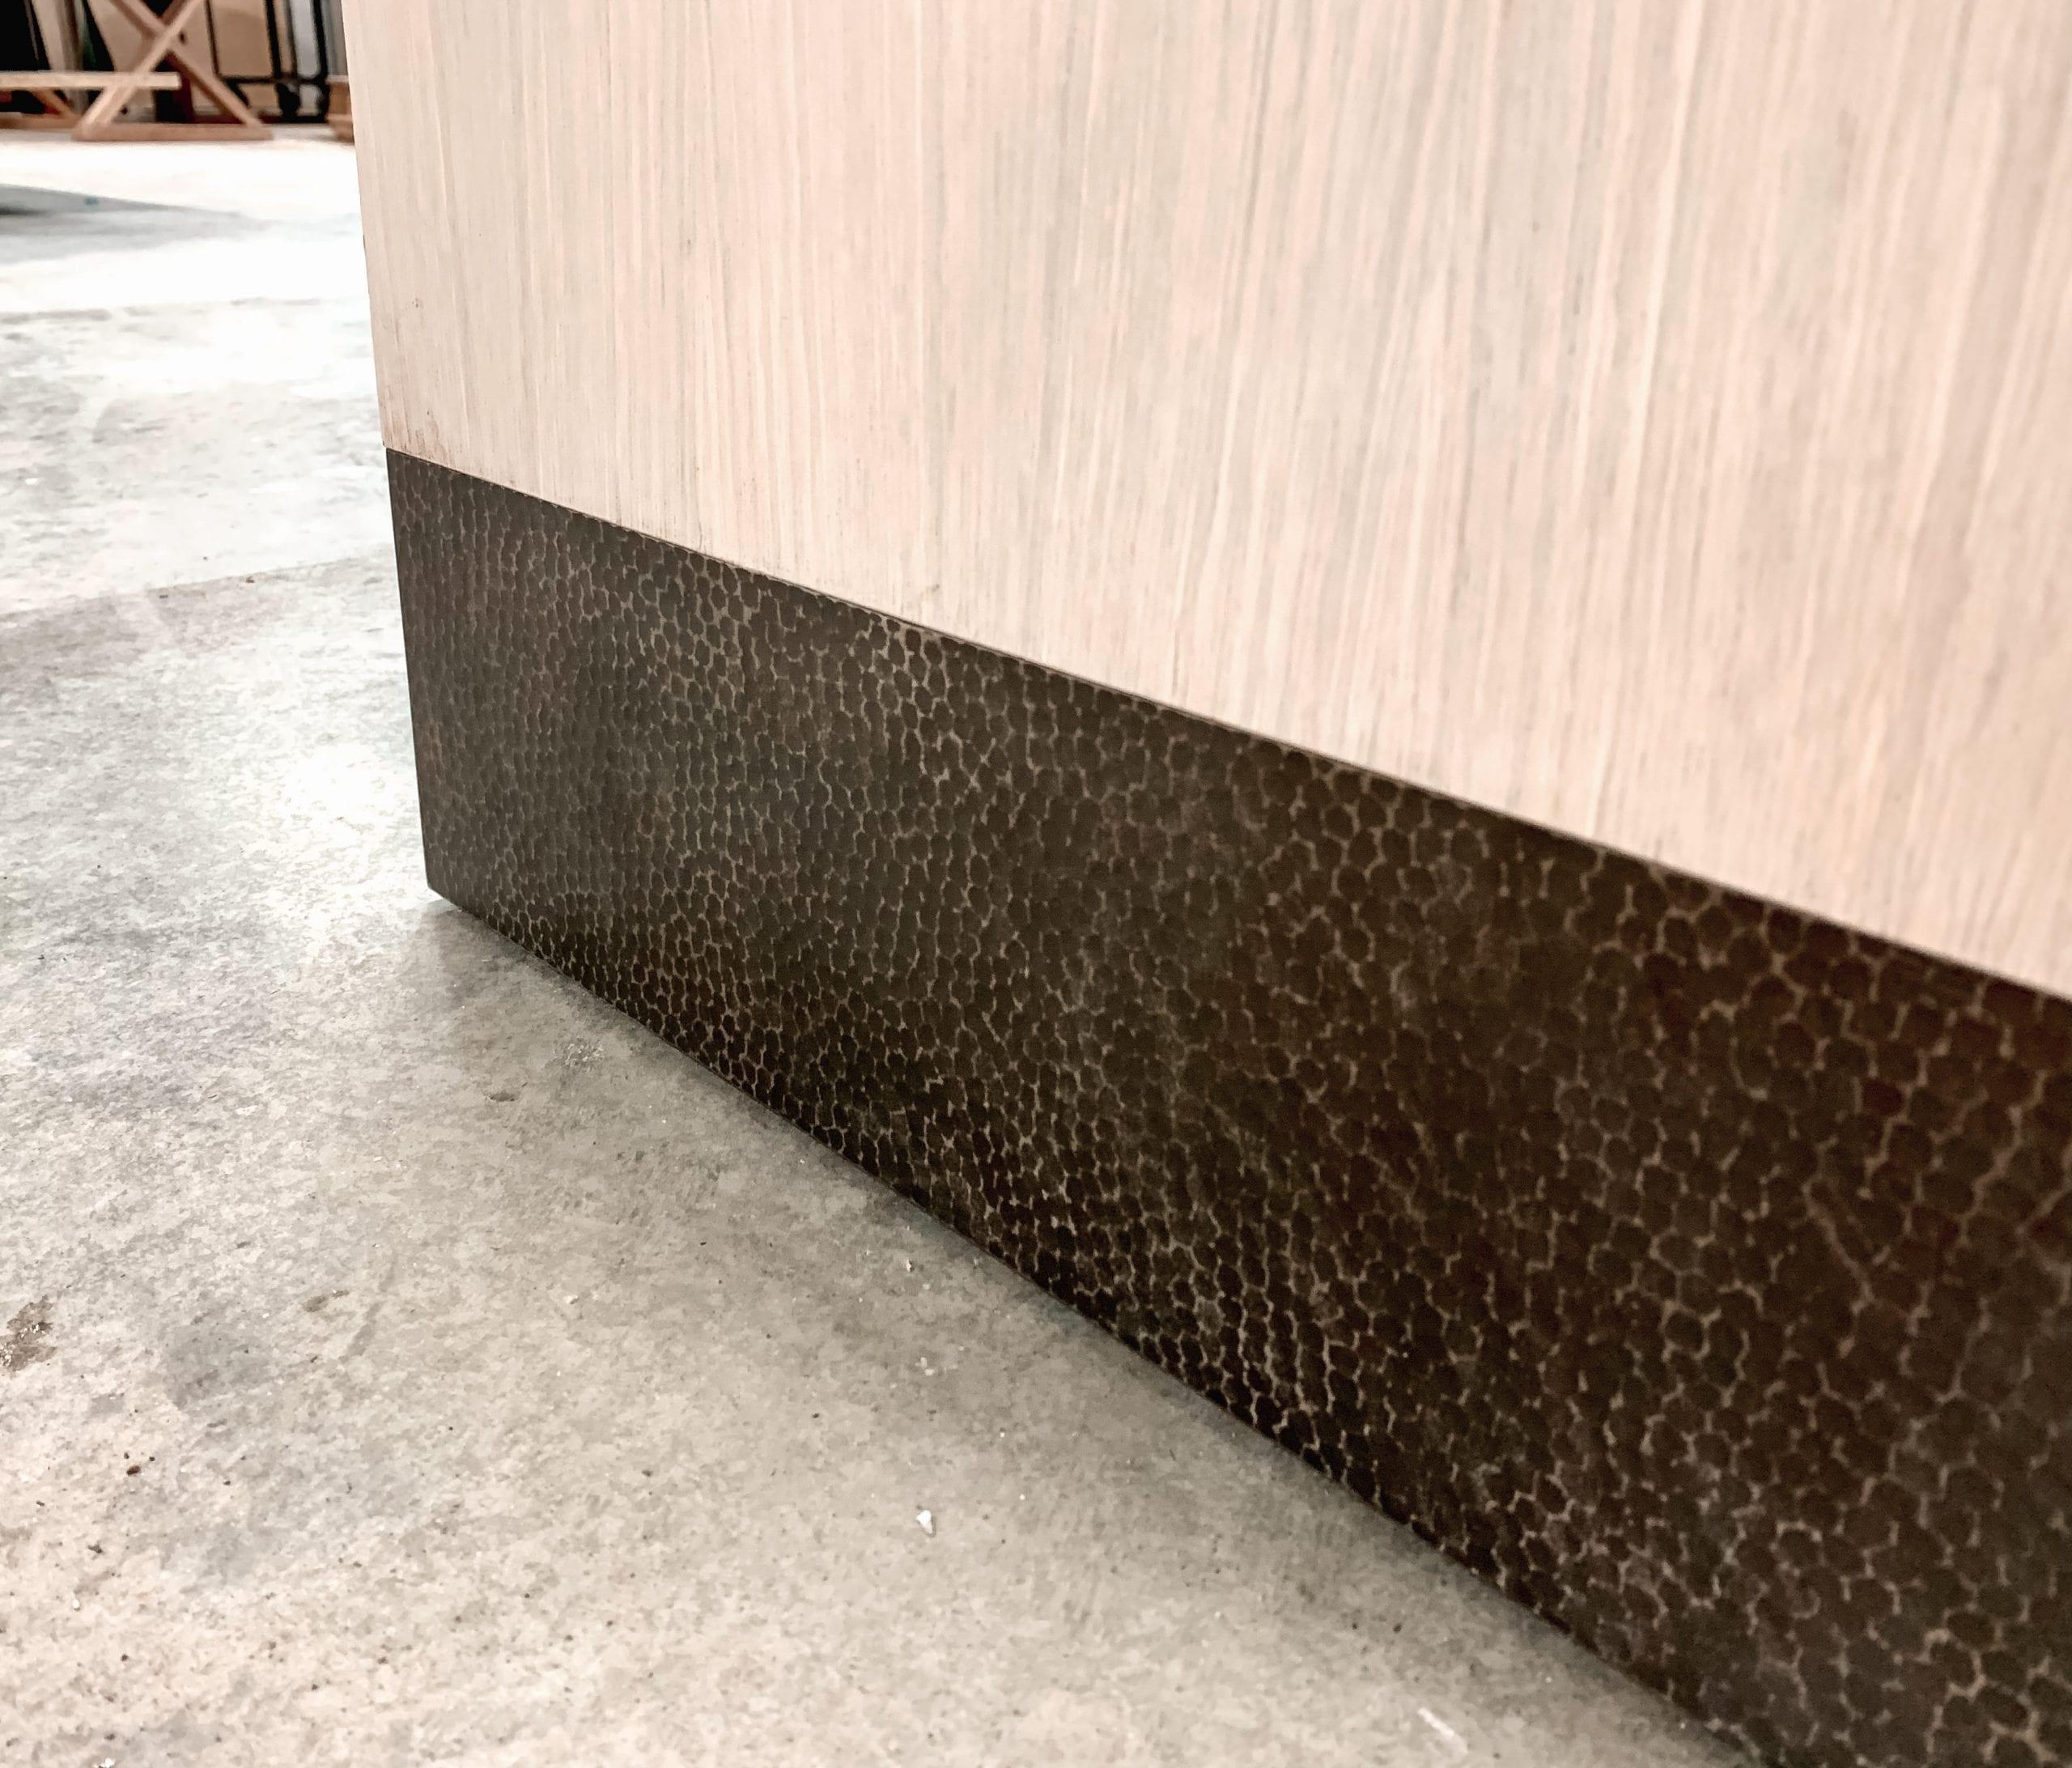 Texture on Furniture by MDM Design Studio